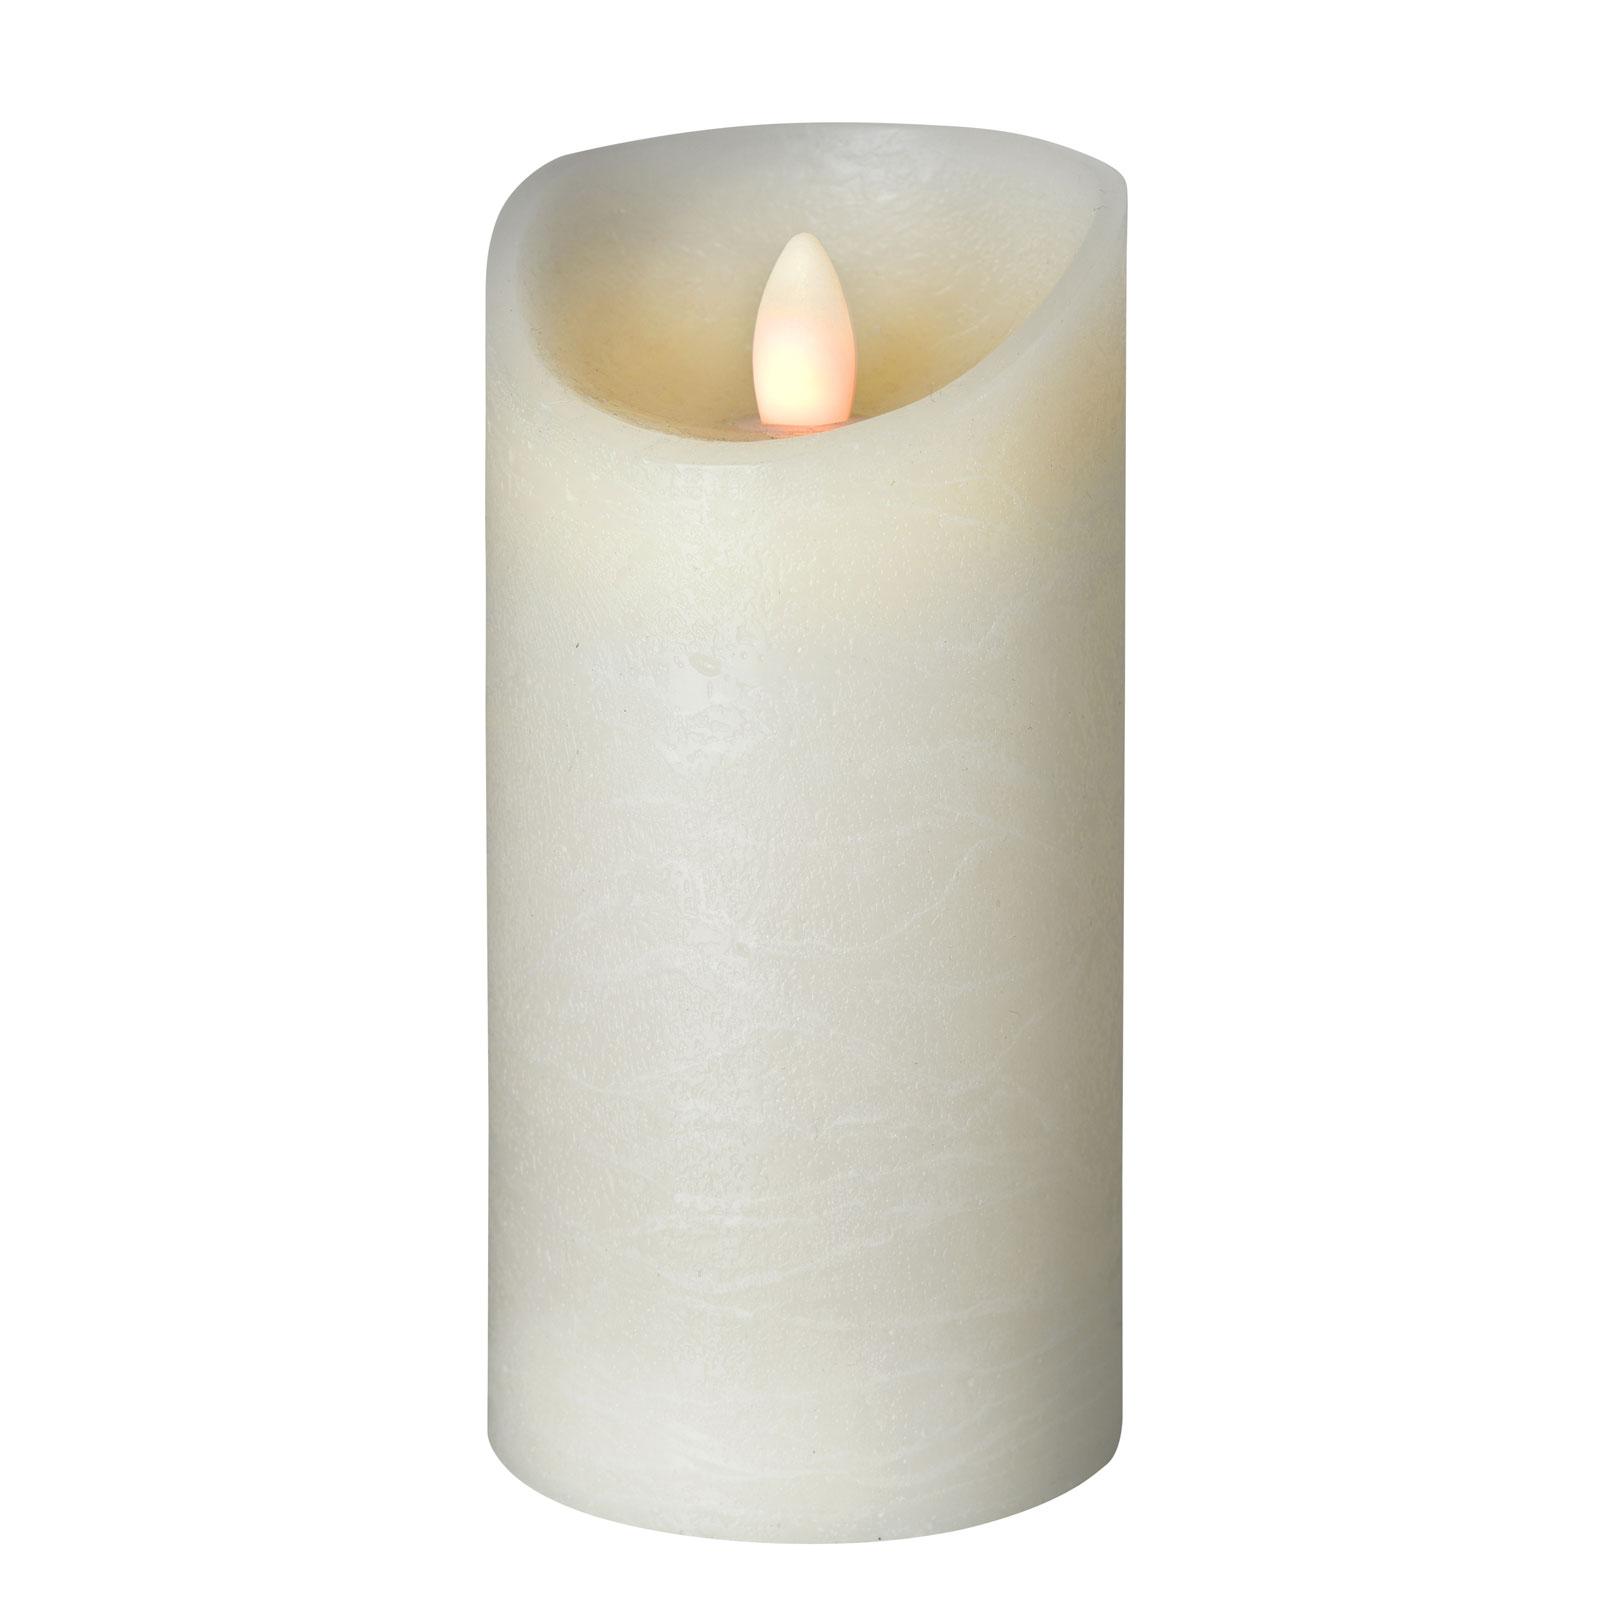 LED-Kerze Shine, Ø 7,5 cm, elfenbein, Höhe 17,5 cm